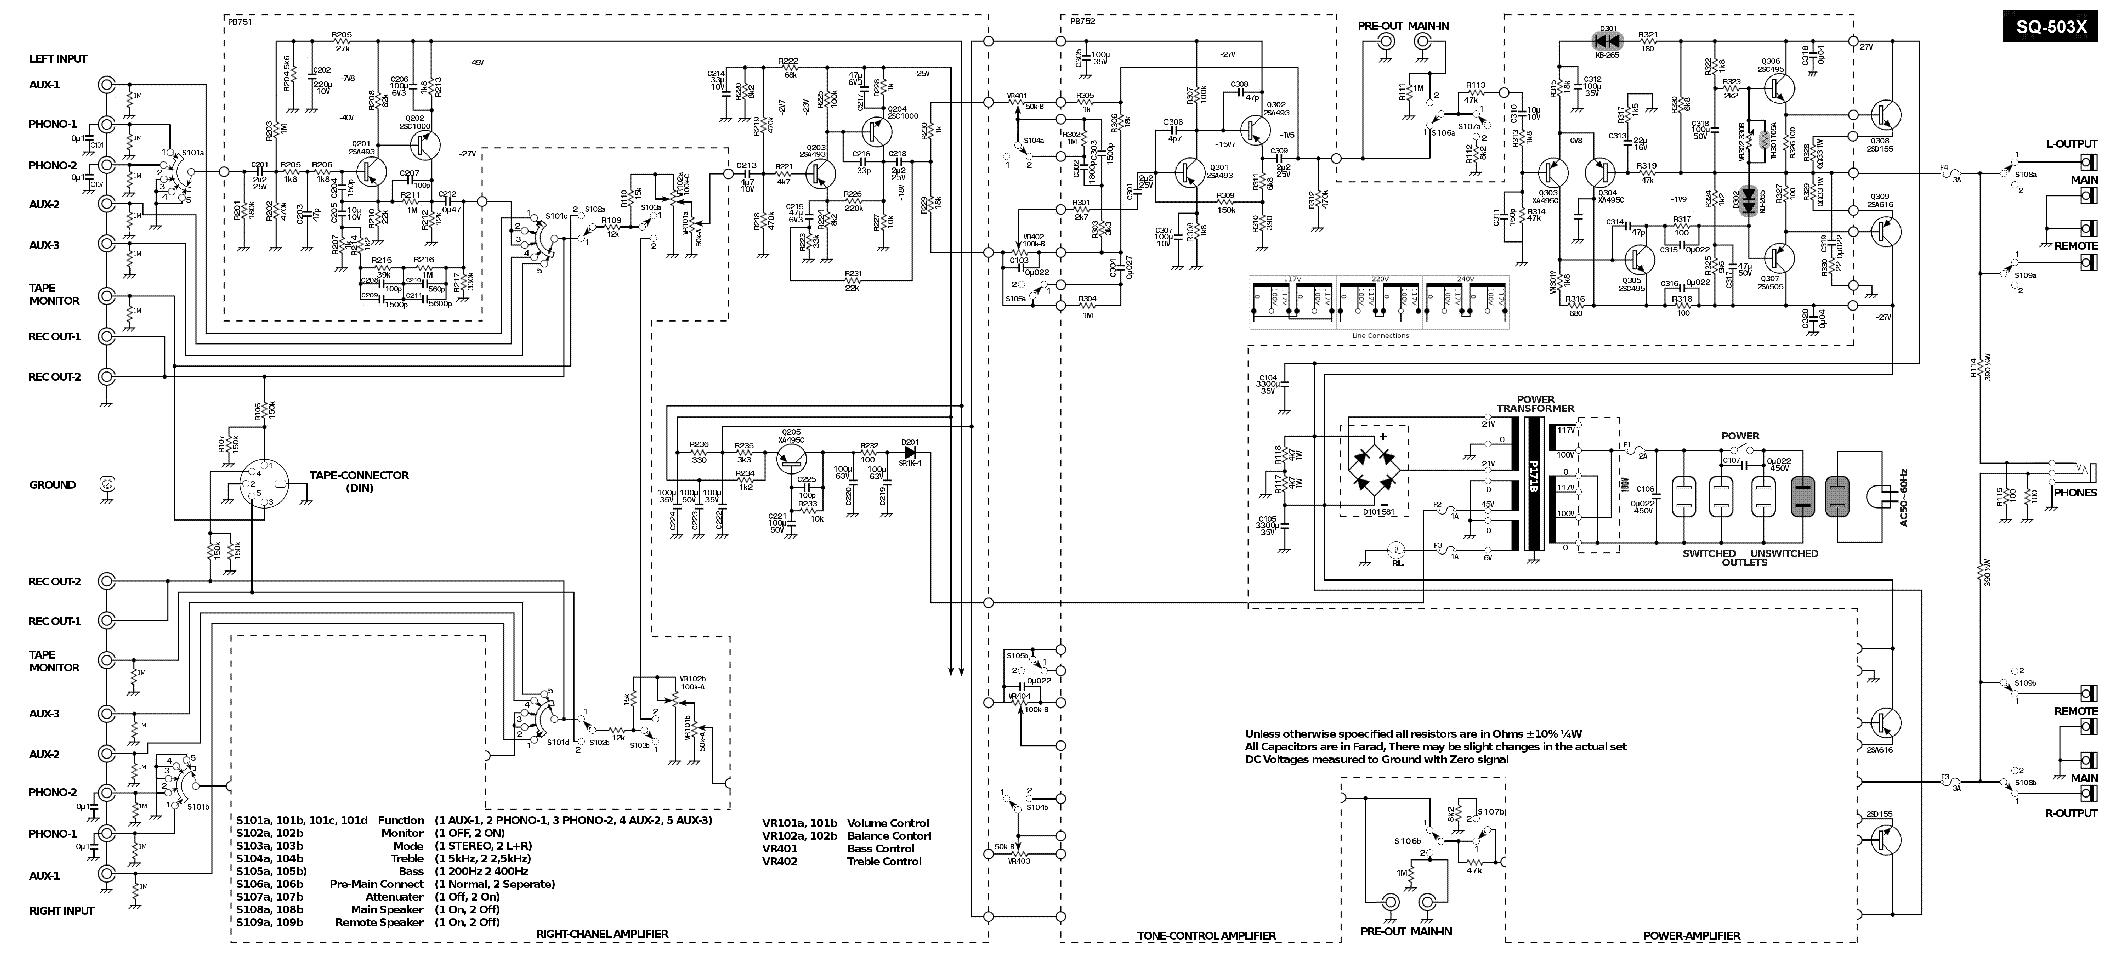 Luxman lv-103 u / lv-105 u manual   integrated amplifiers   luxman.